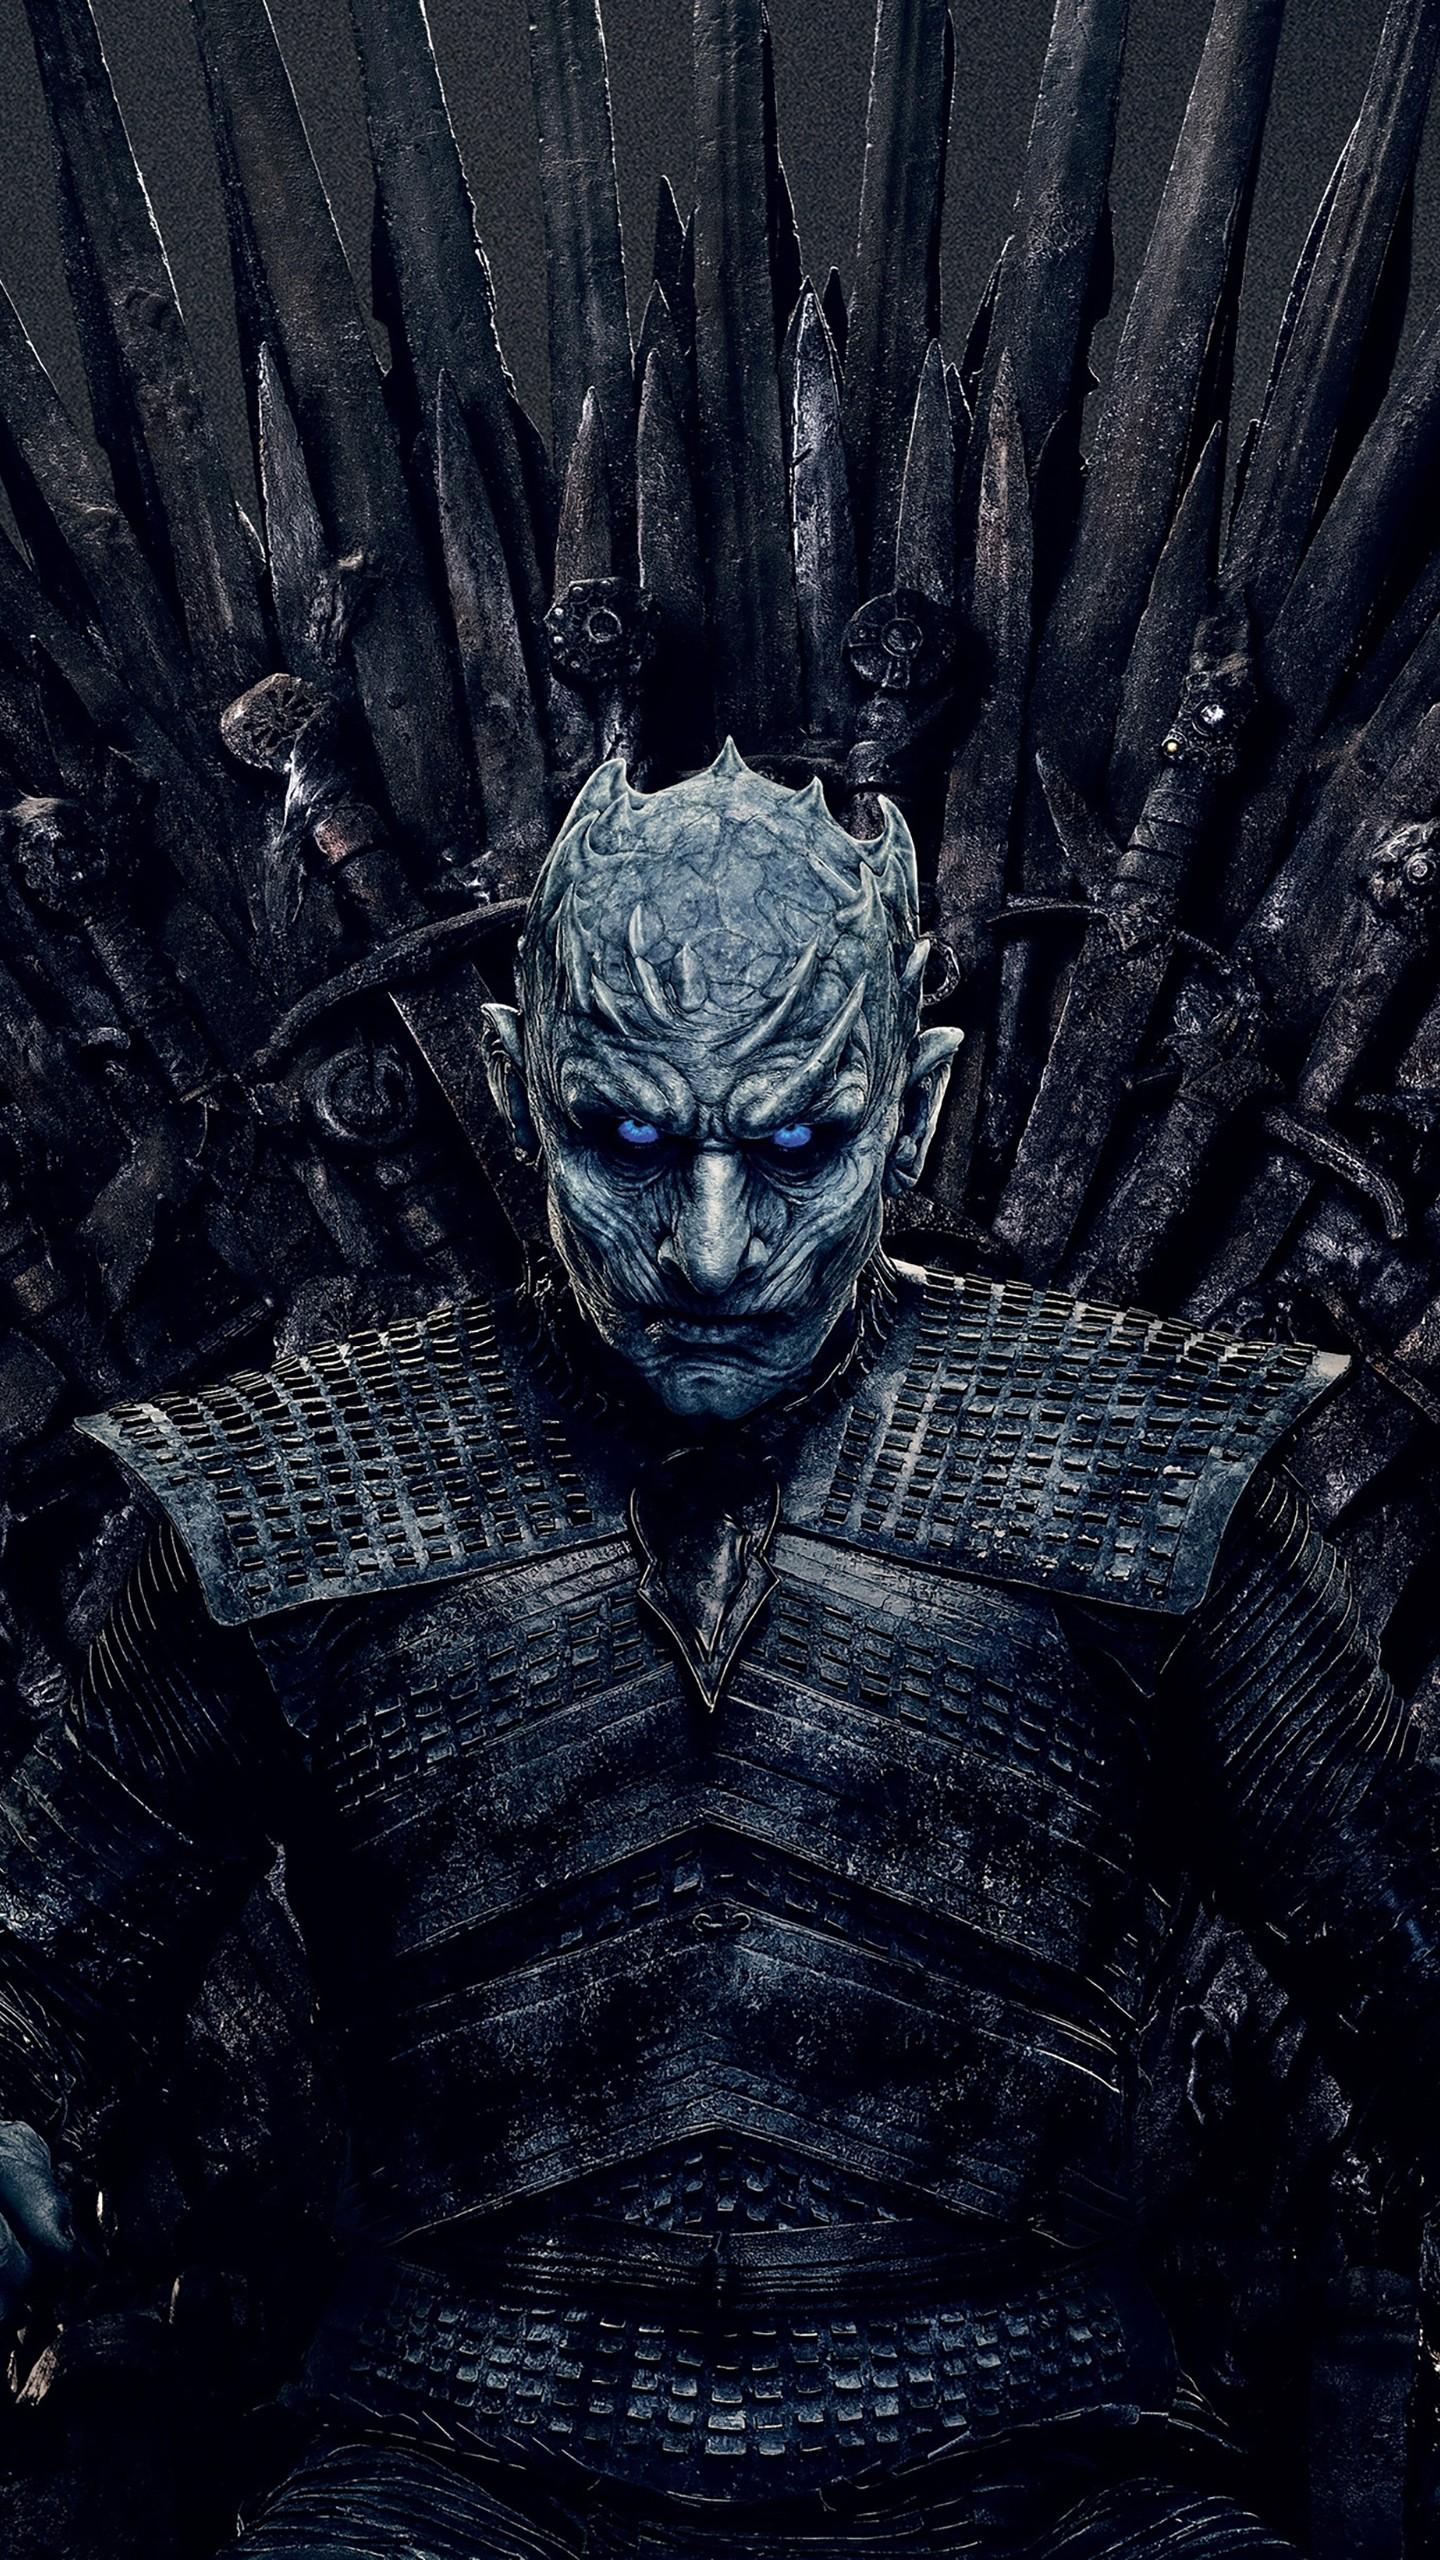 Vikings Wallpaper Iphone X Night King In Game Of Thrones Season 8 4k Wallpapers Hd